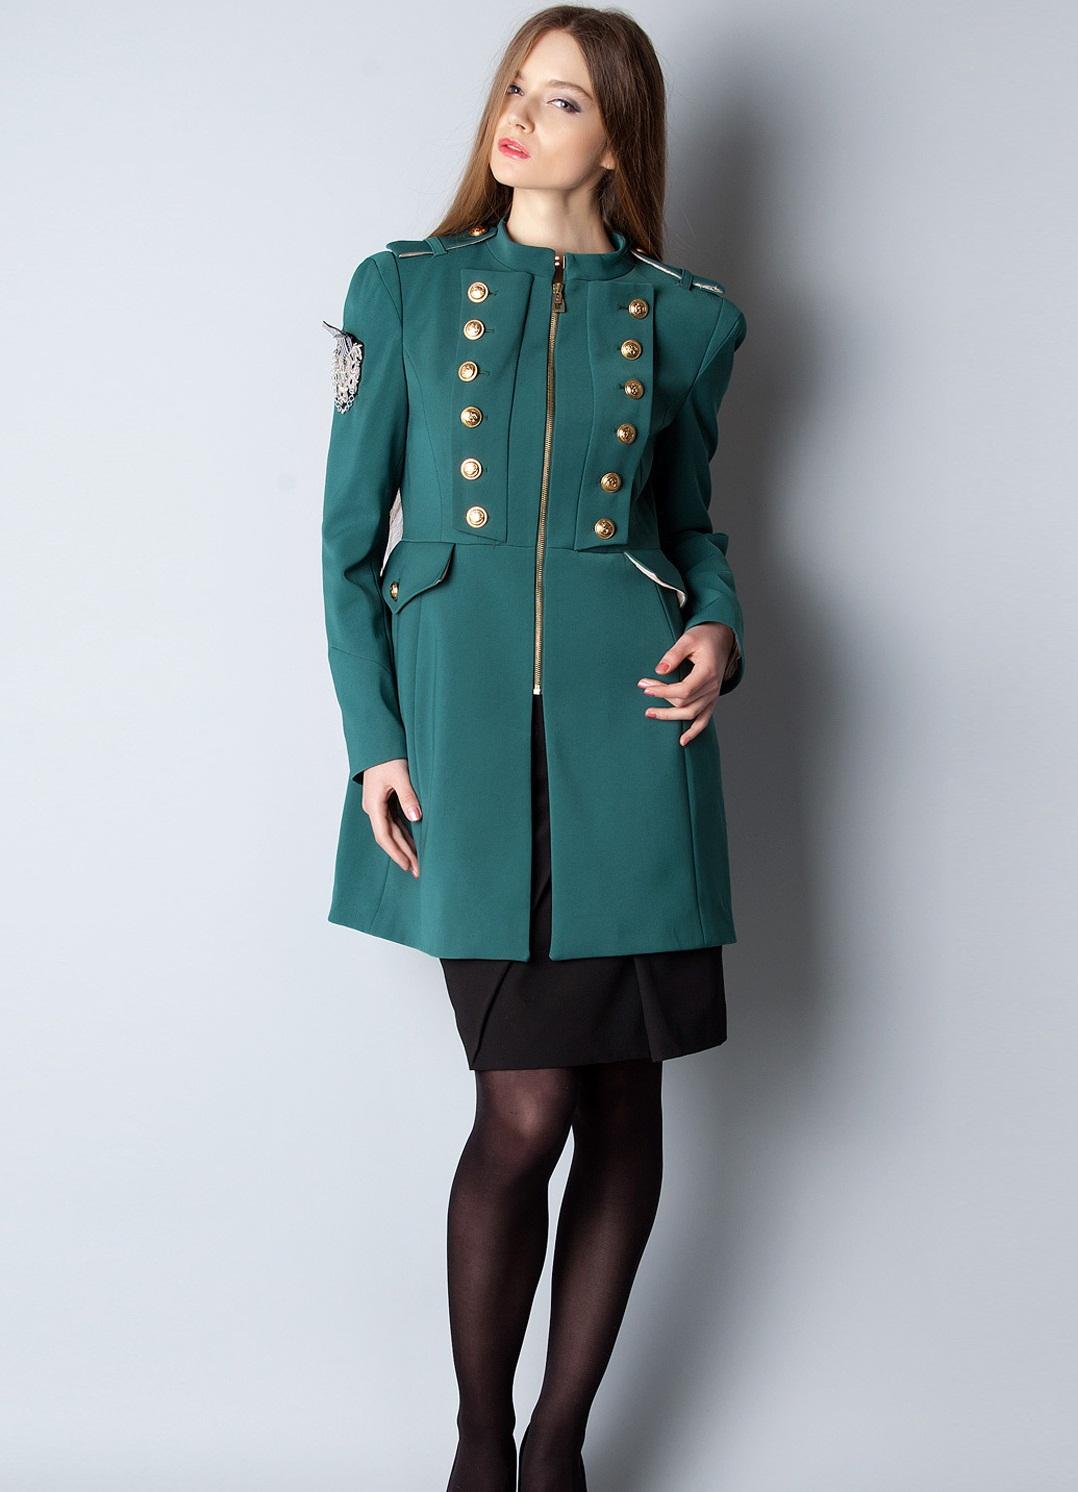 93aa6423c67 Пальто коллекции весна 2014